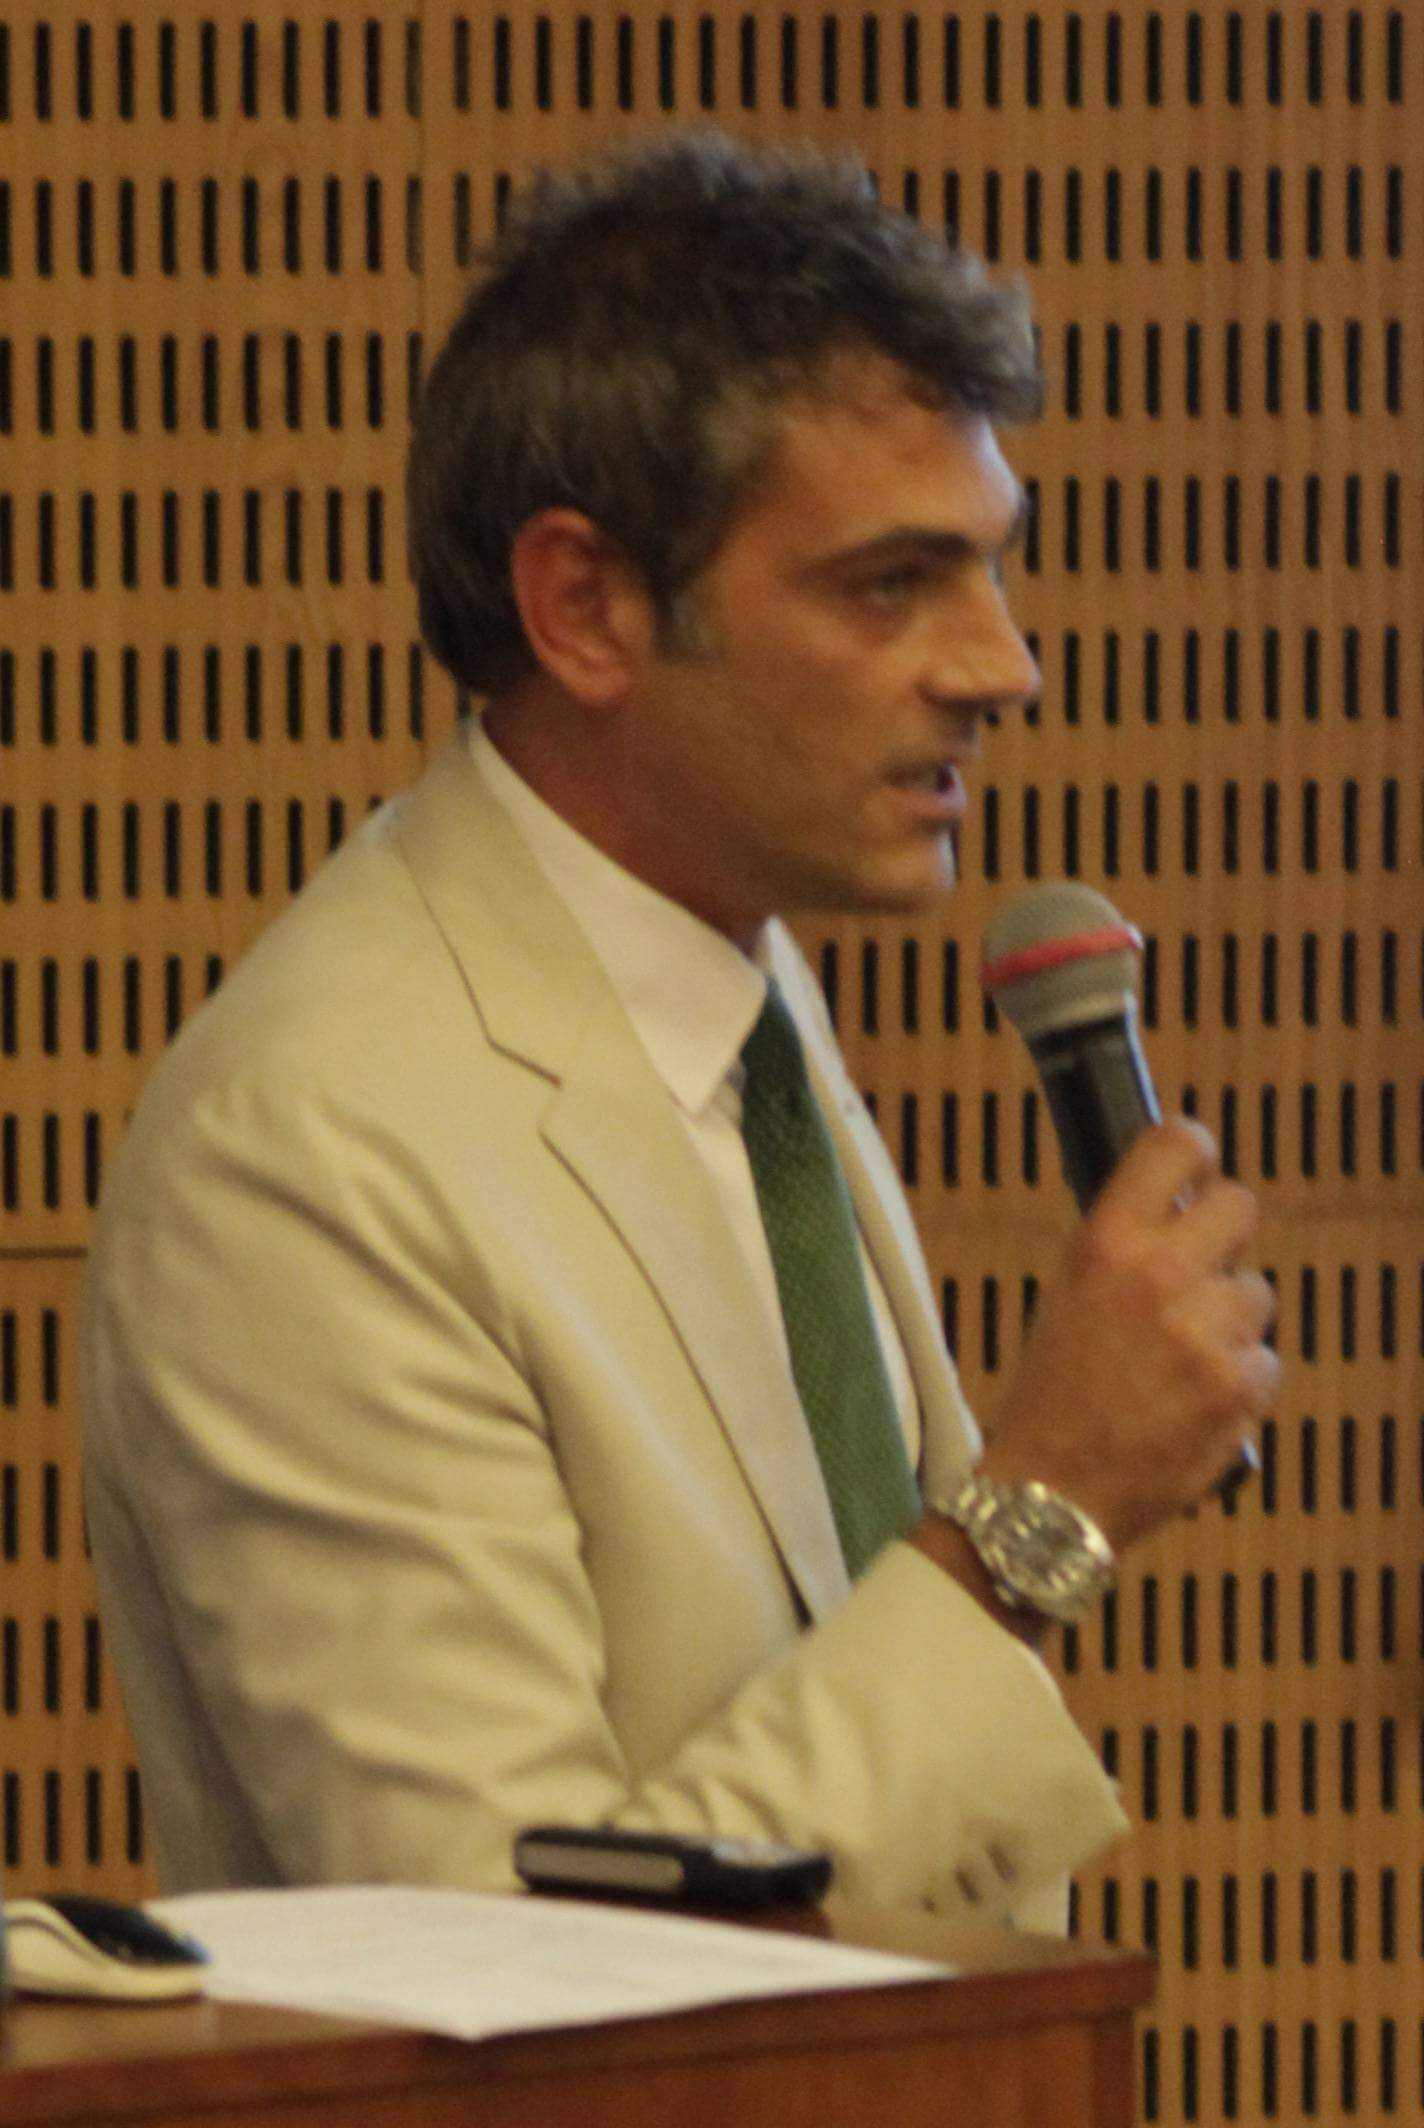 Pietro Santagata, Titolare Ecoepoque